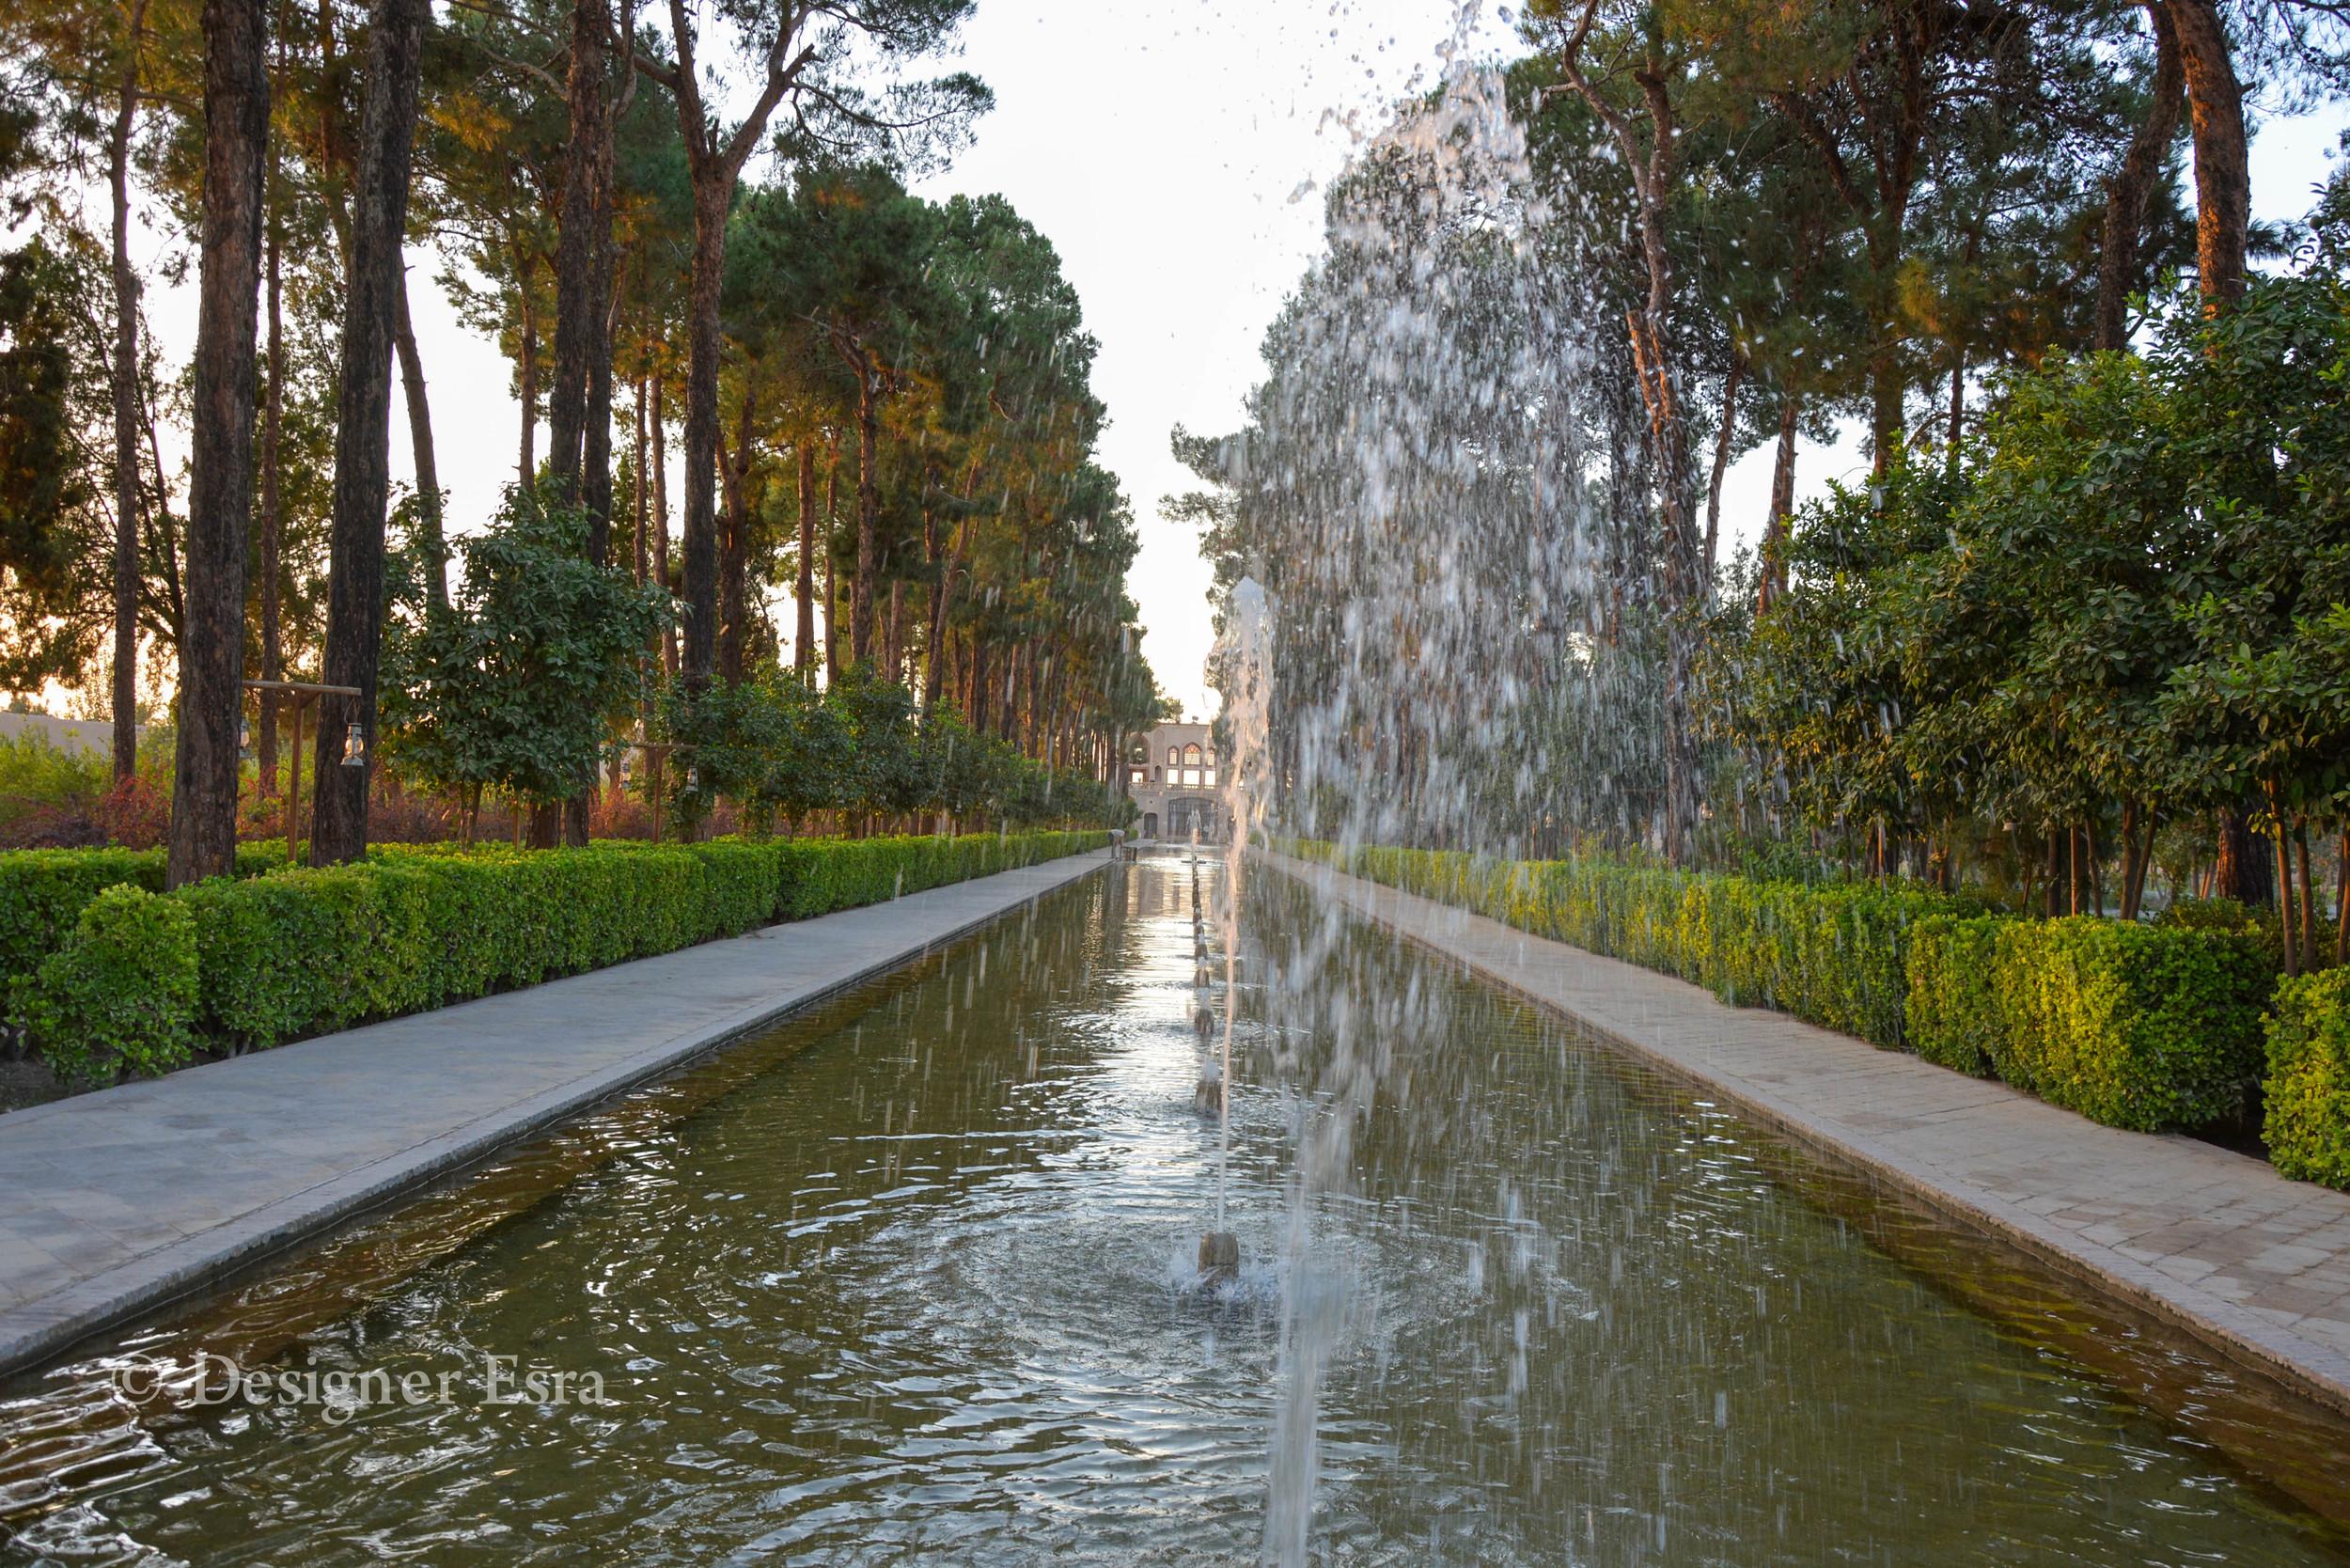 Bagh-I Dawlatabad, Fountain in the Yazd Garden